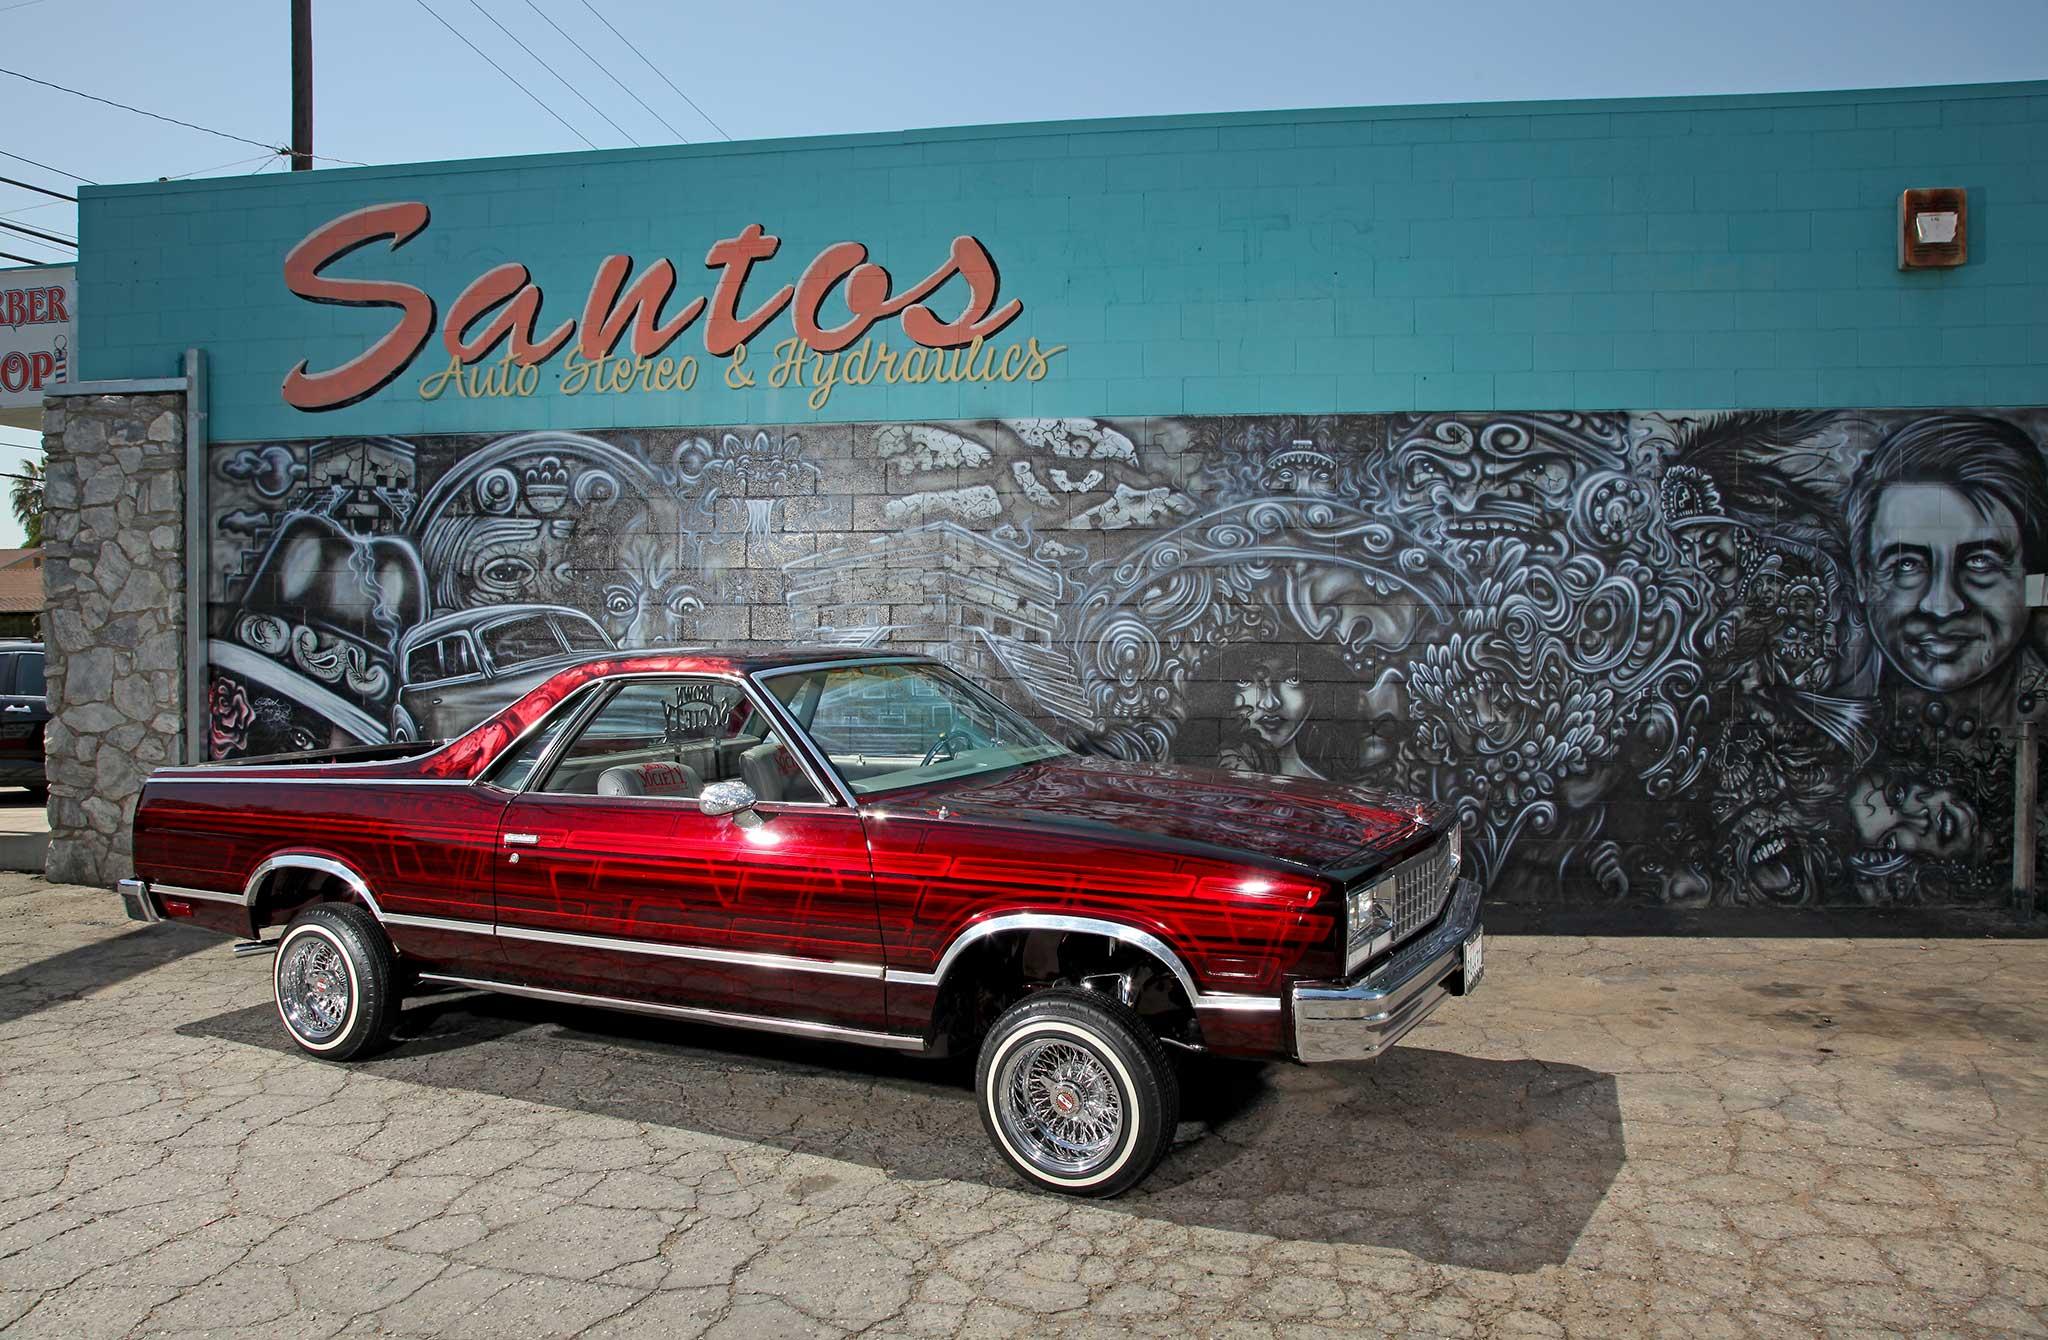 Lowrider Rims And Tires >> 1985 Chevrolet El Camino - The Elco-Holic - Lowrider